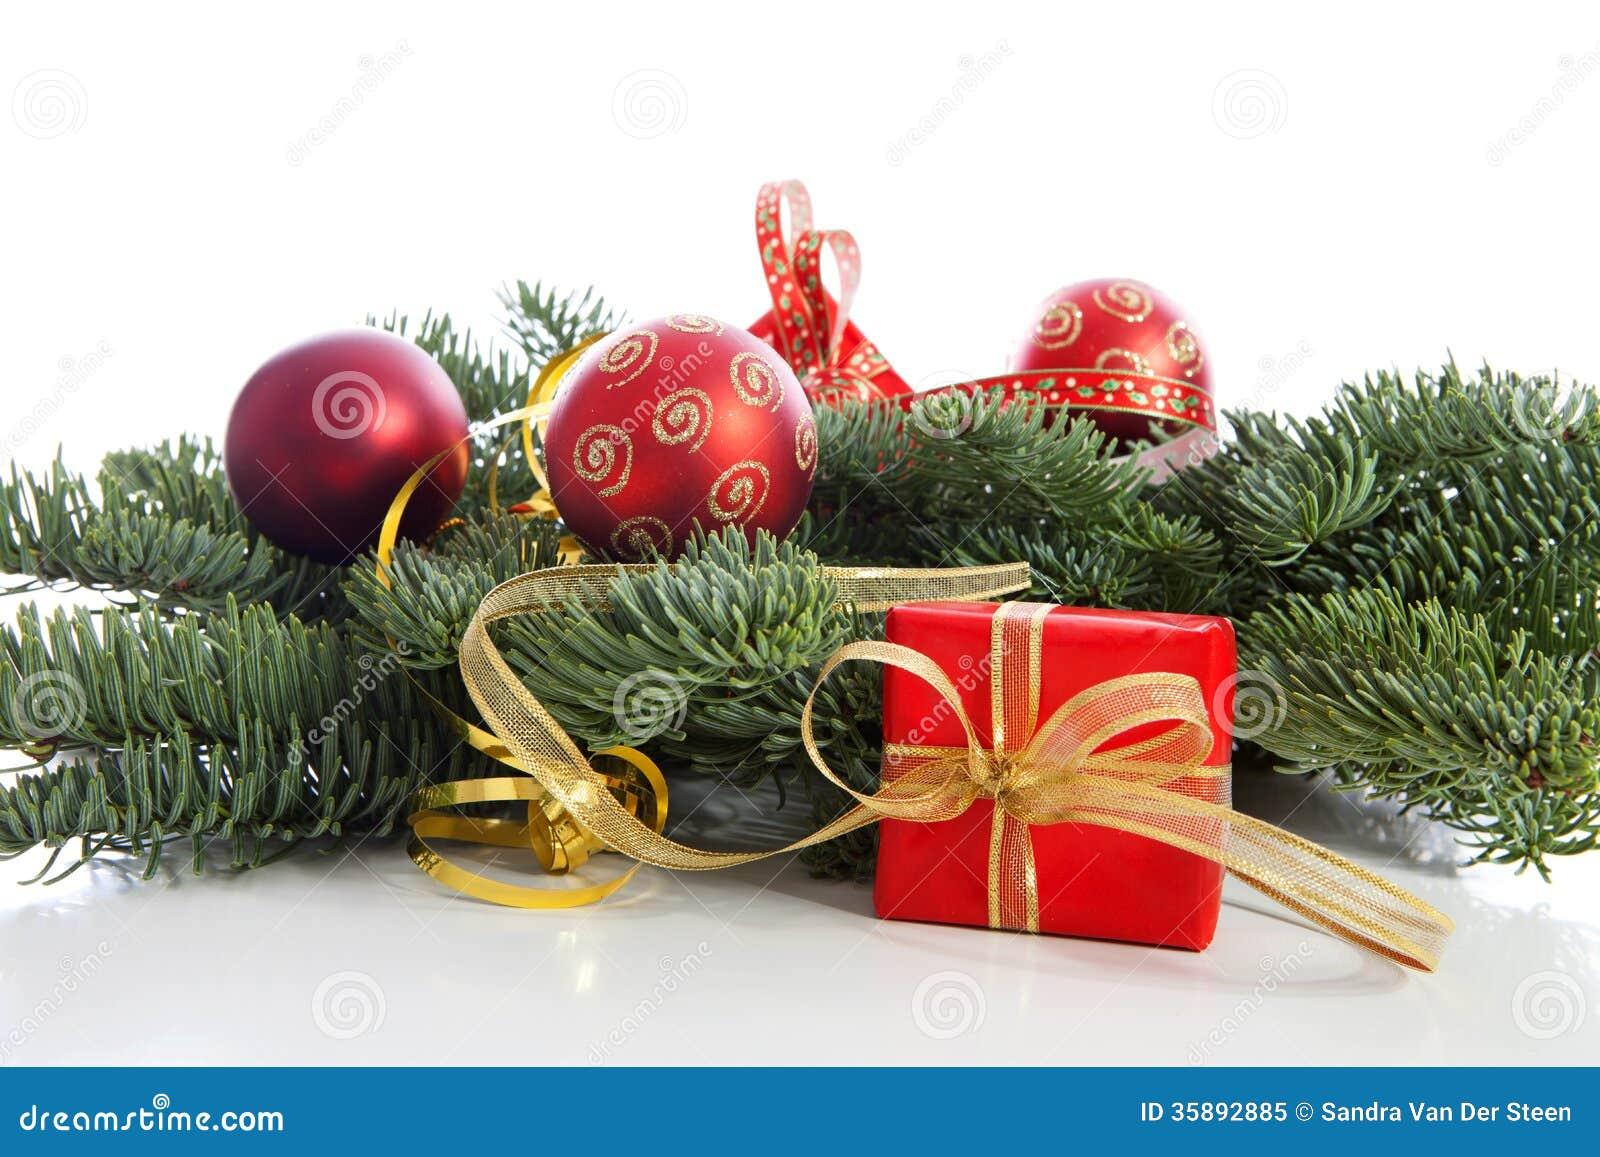 Christmas Decoration On Pine Tree Royalty Free Stock Photo